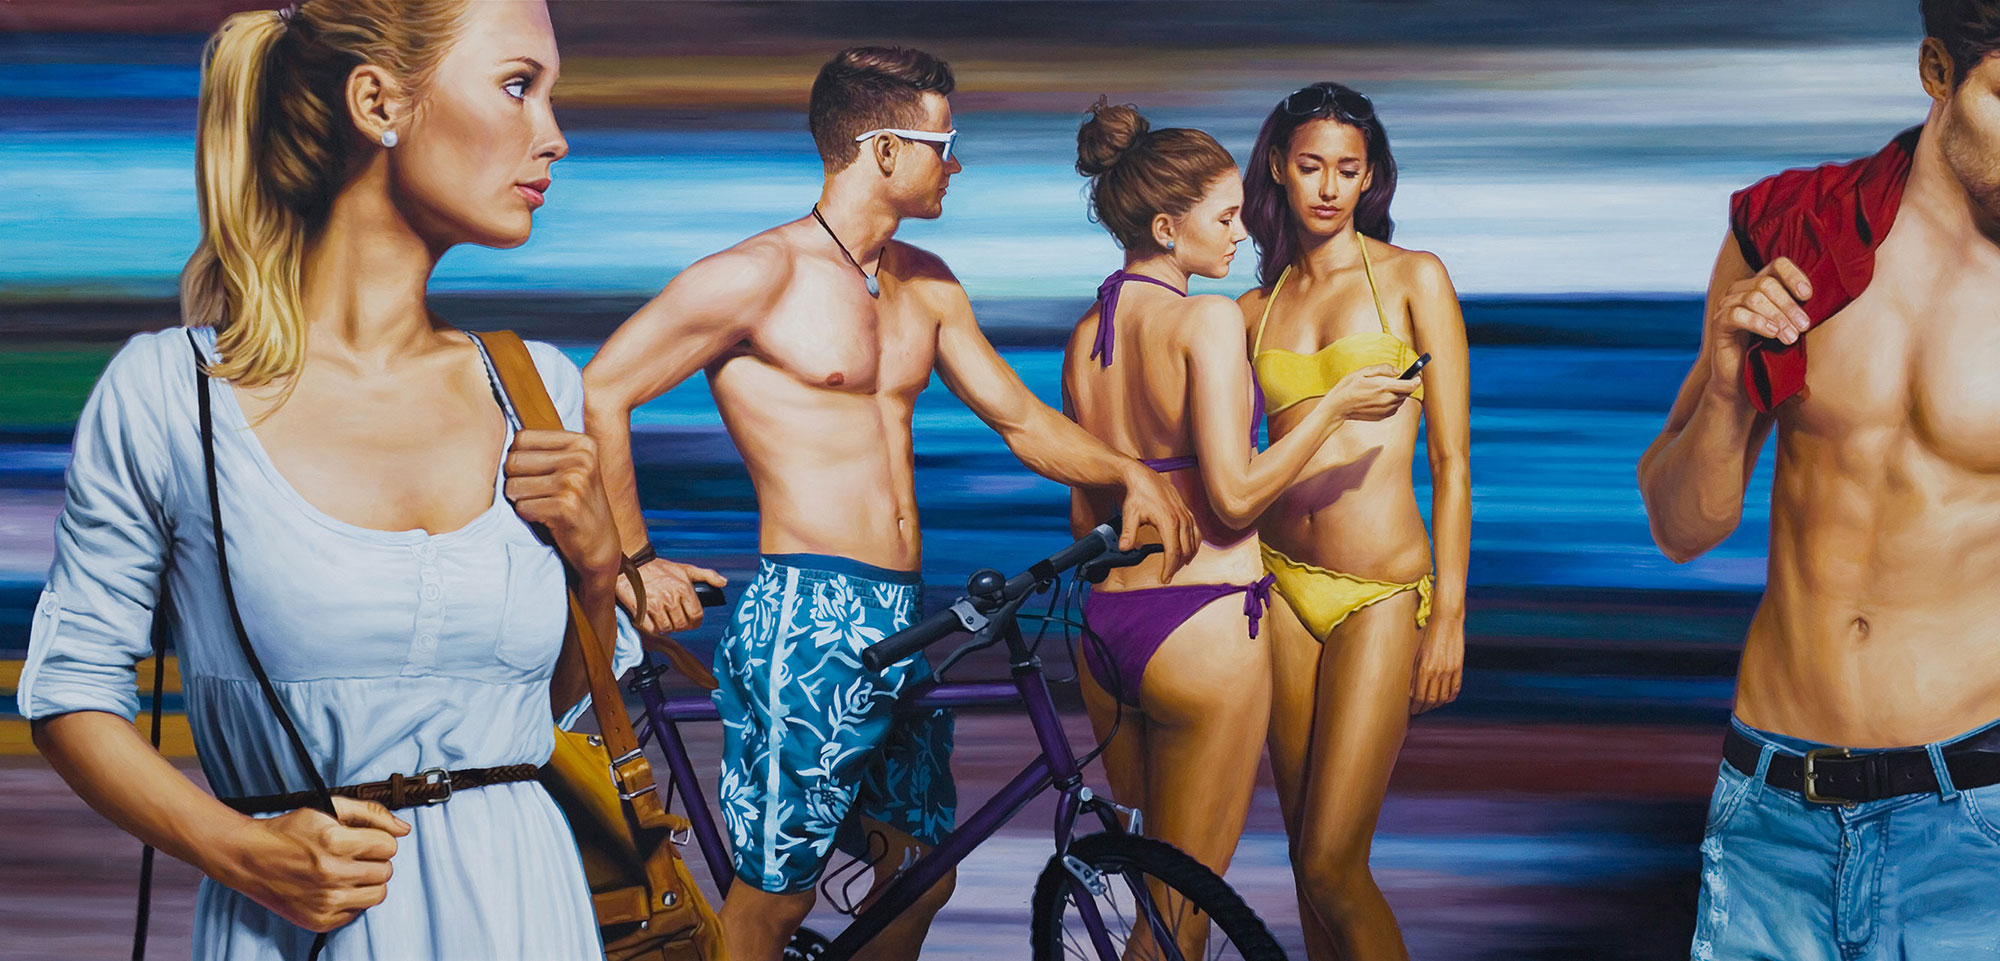 Models in Bademoden von Christopher Corso